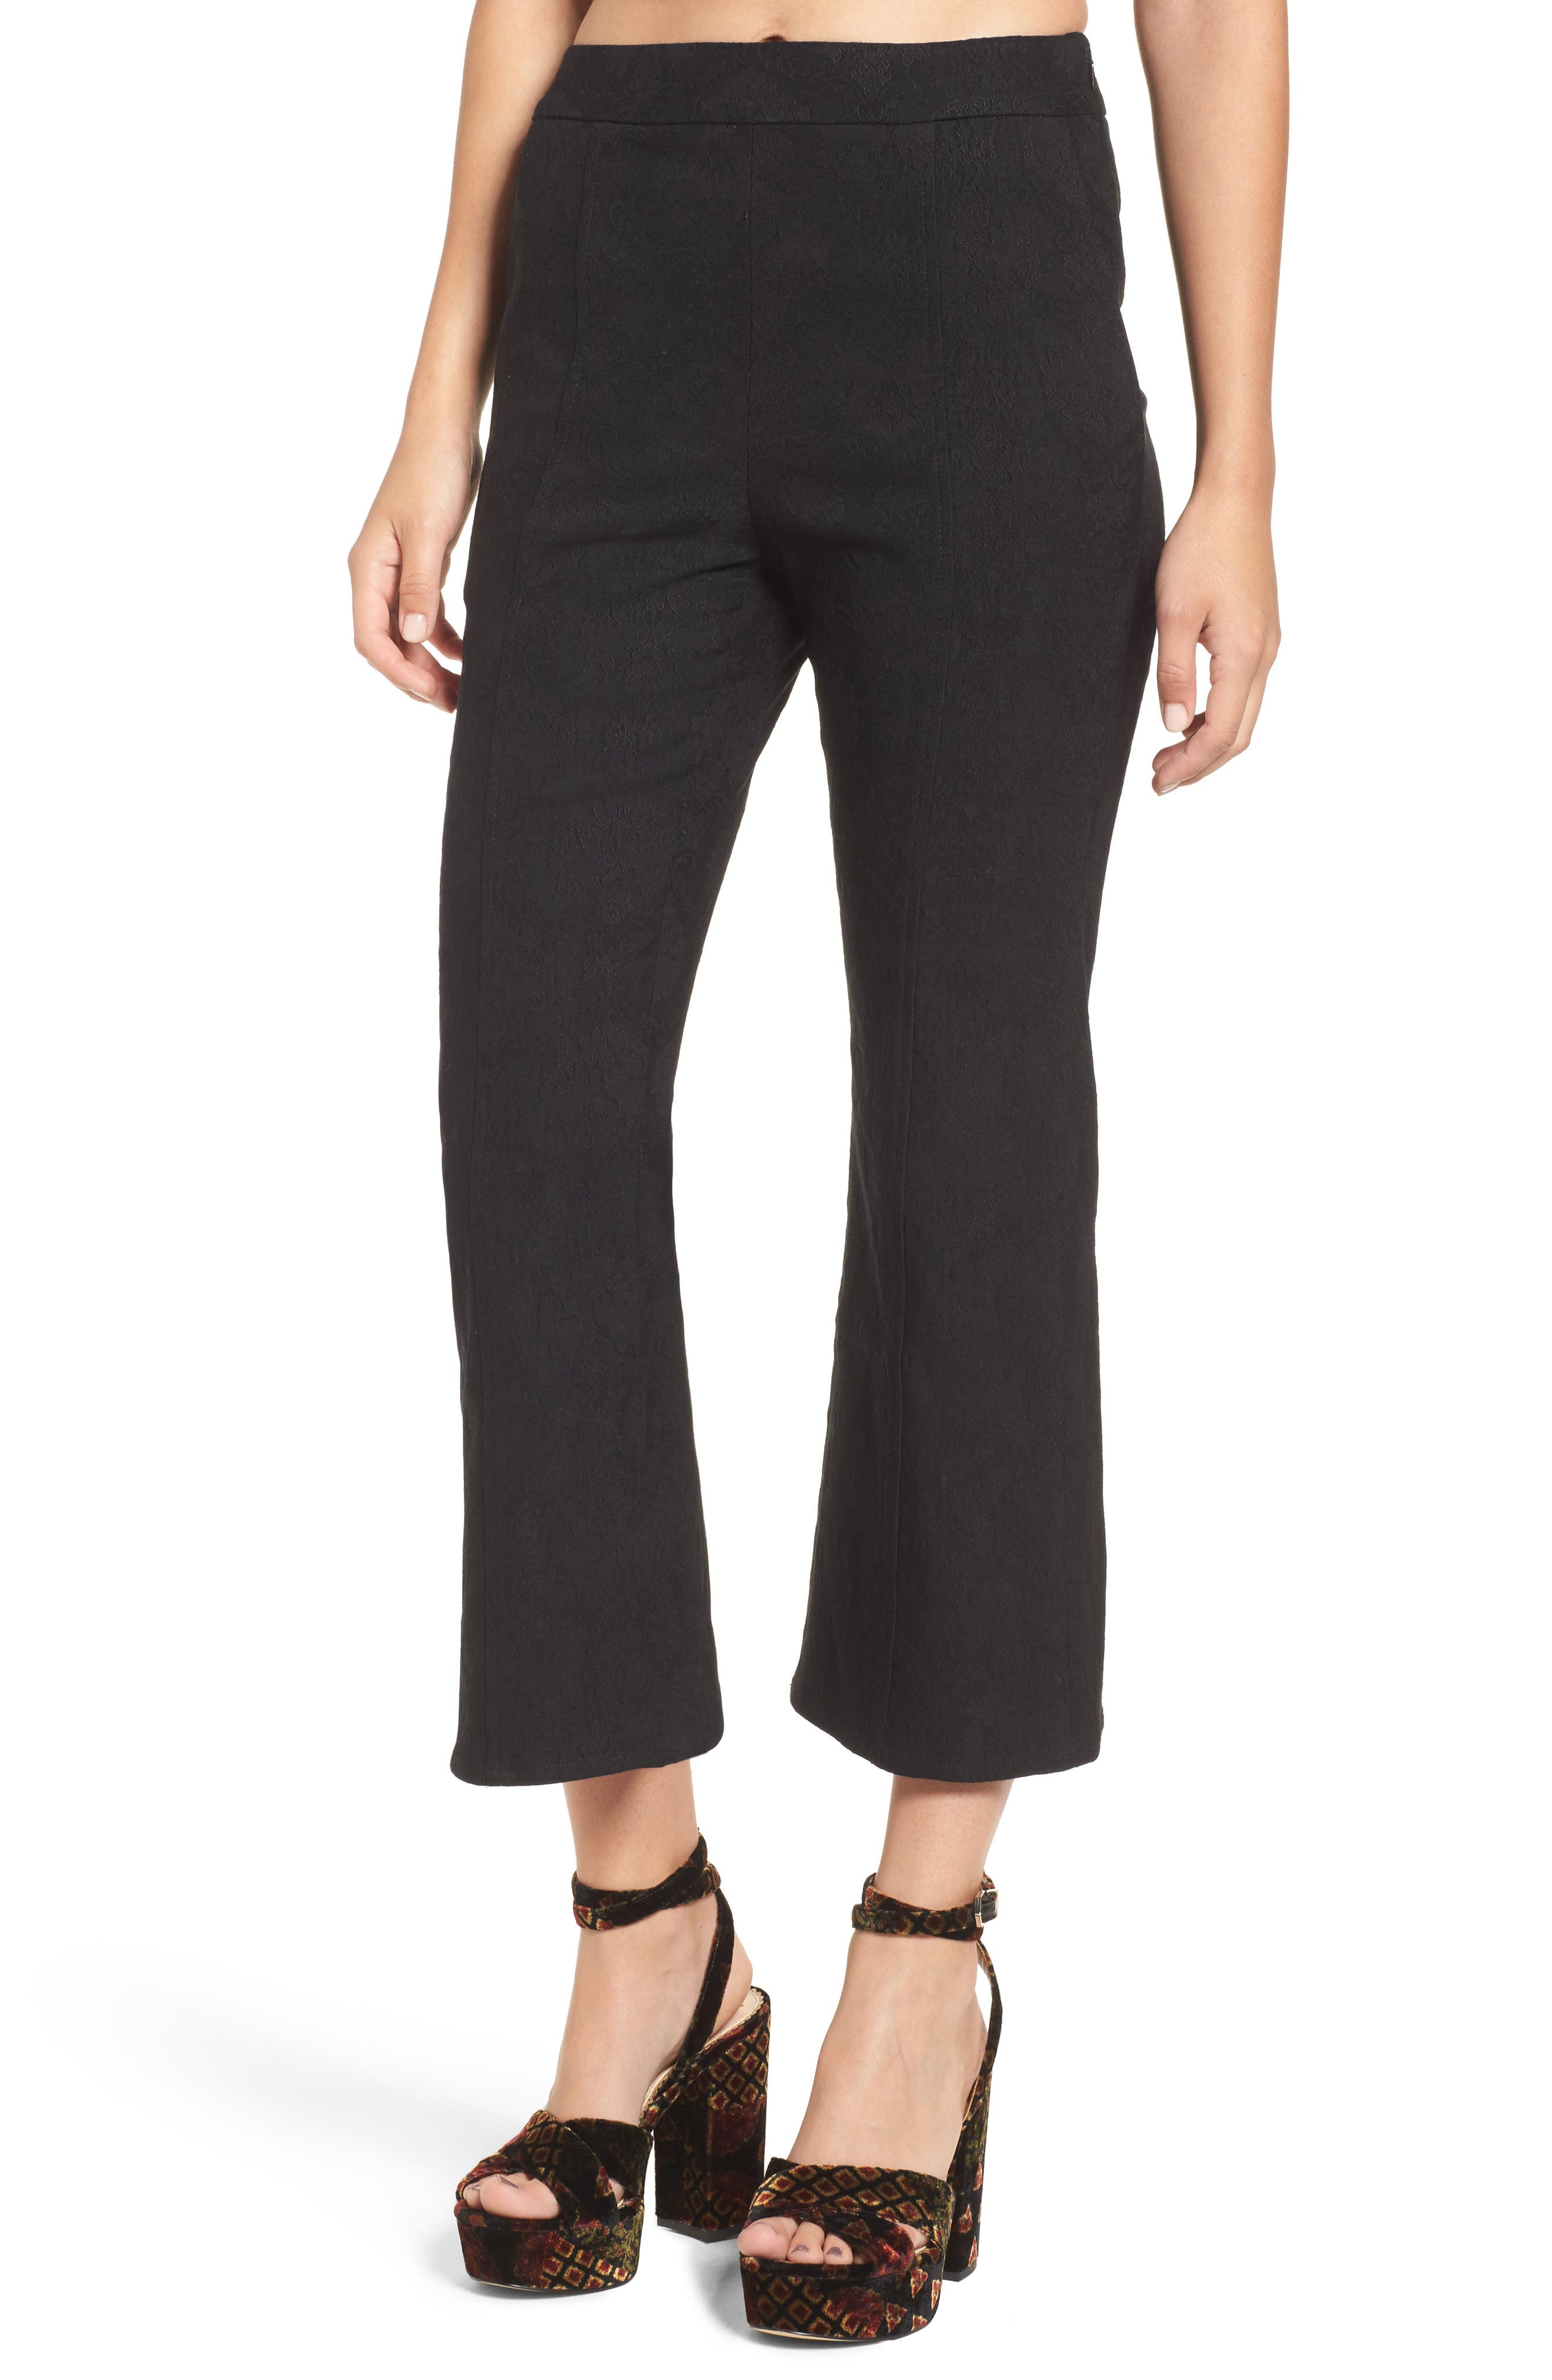 Leigh High Waist Crop Pants,                         Main,                         color, Black